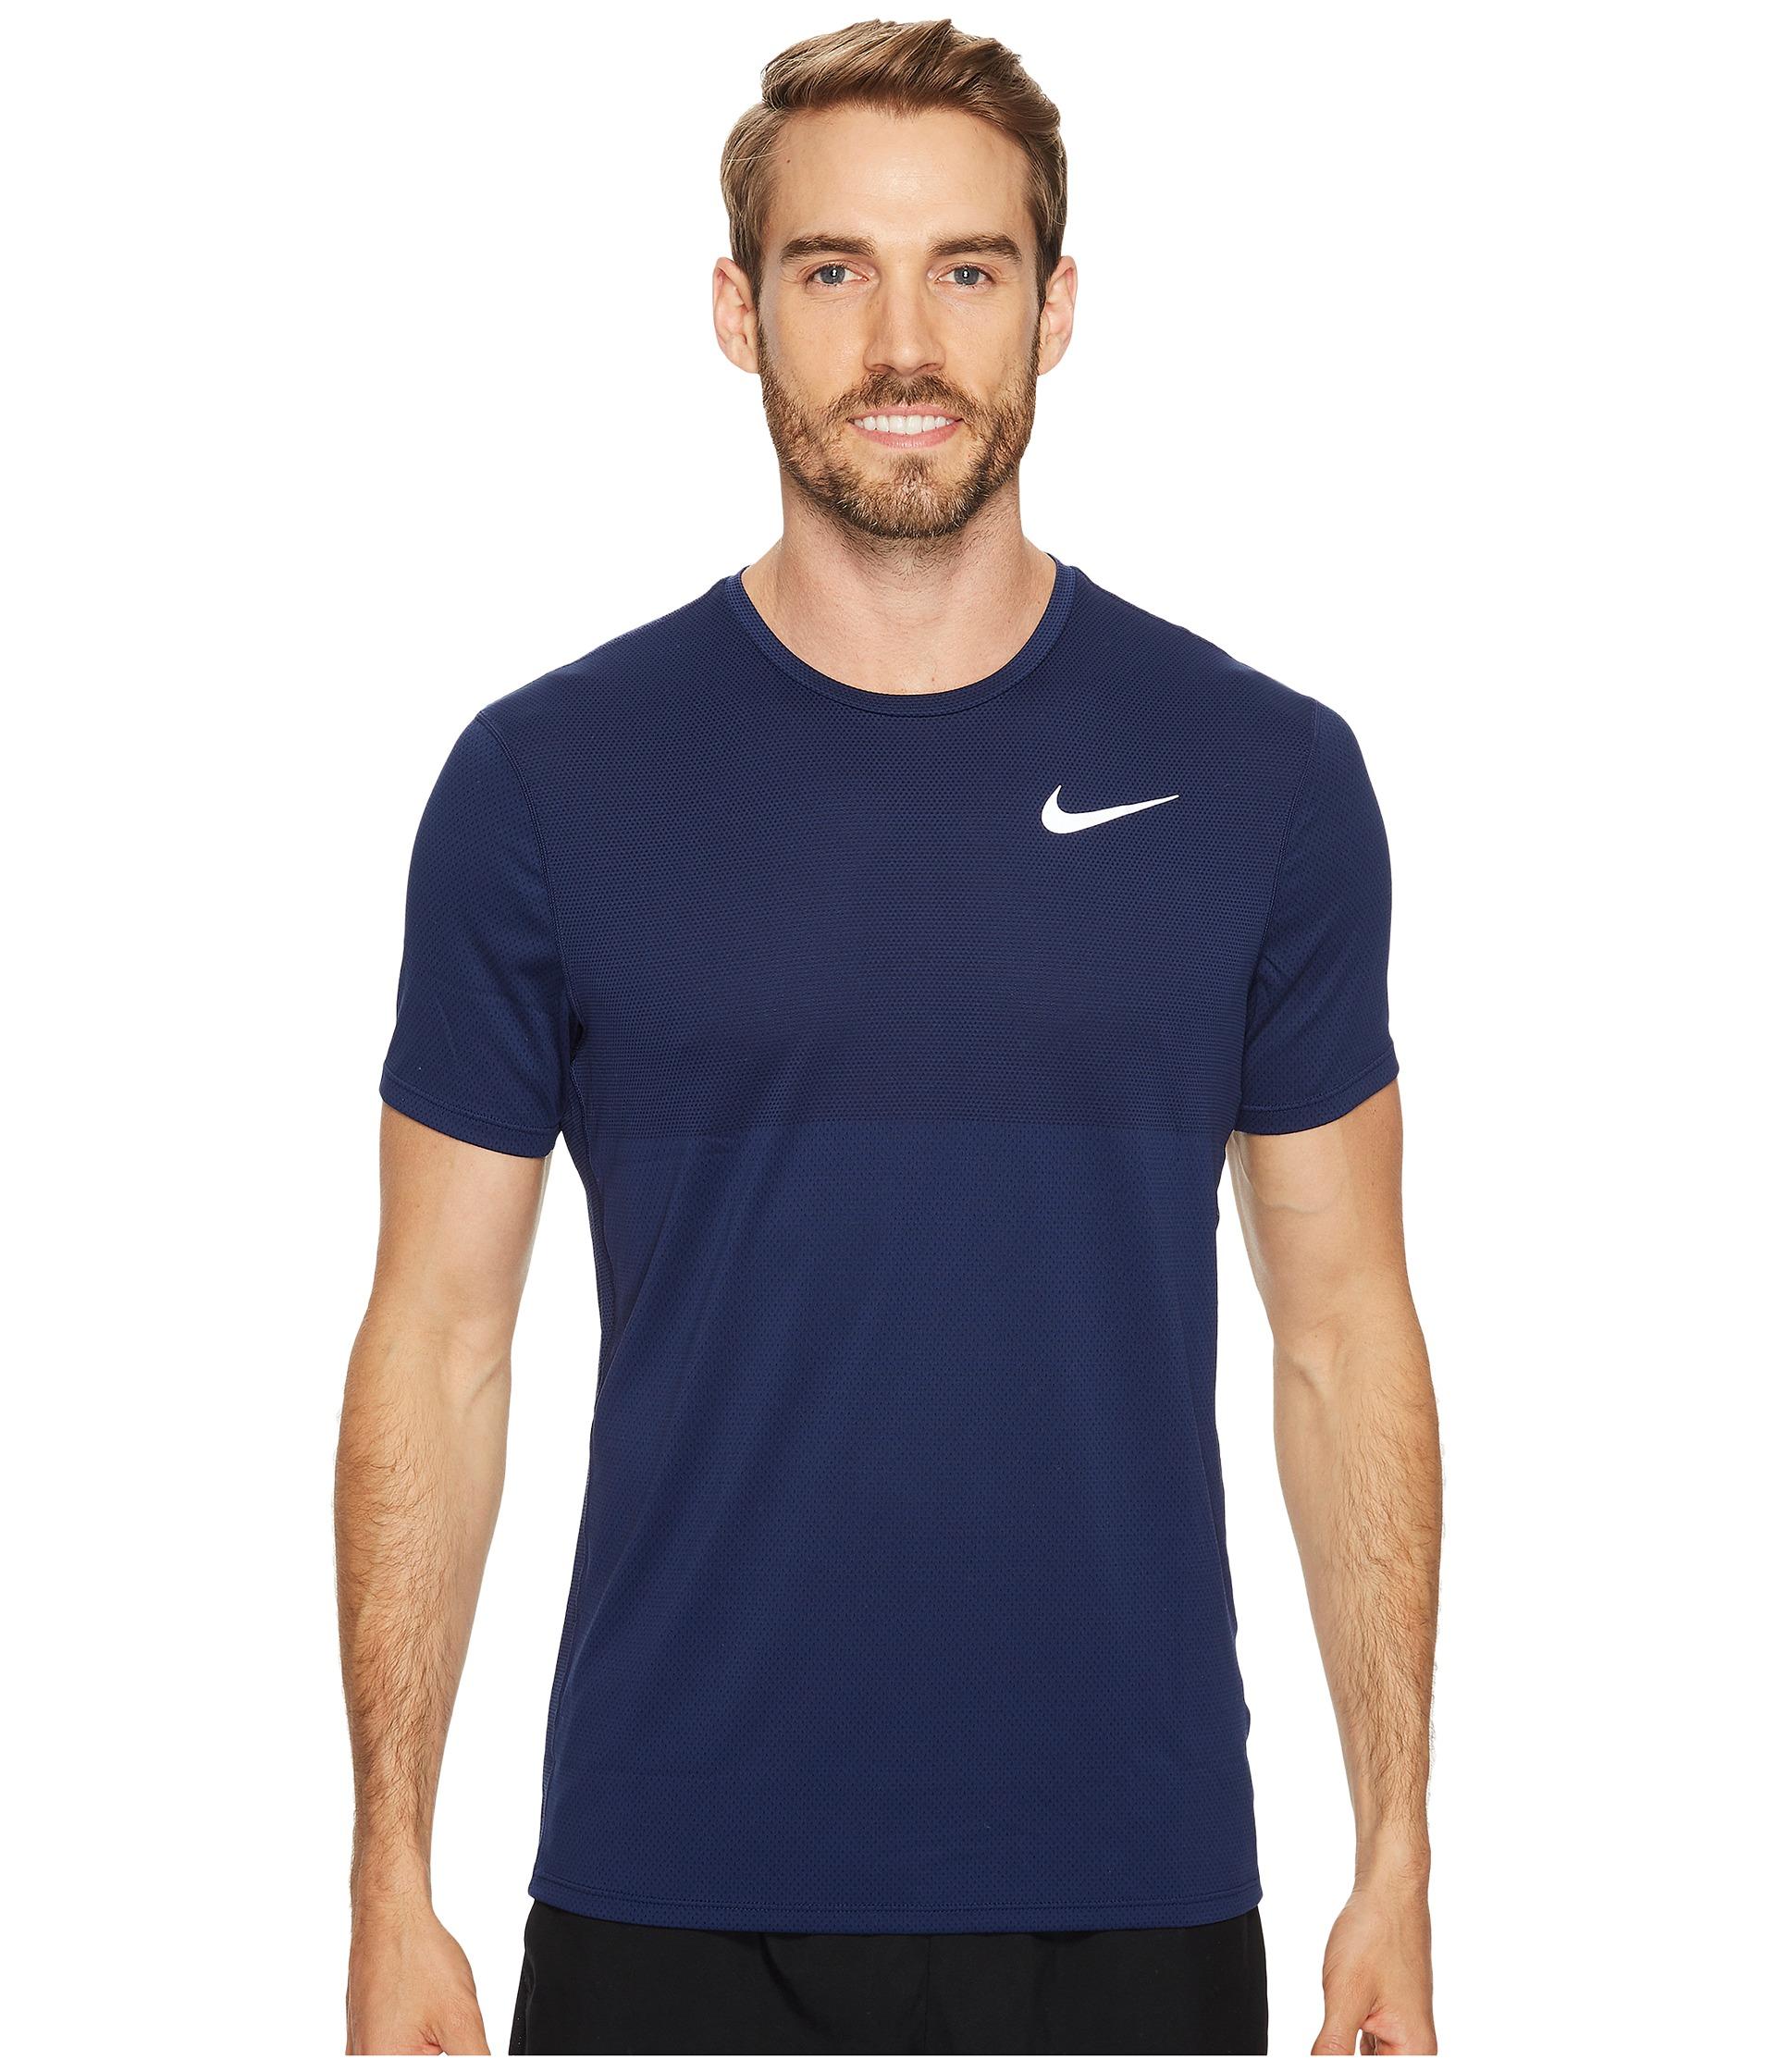 Nike Zonal Cooling Relay Short Sleeve Running Top at new ... 01bacfae7